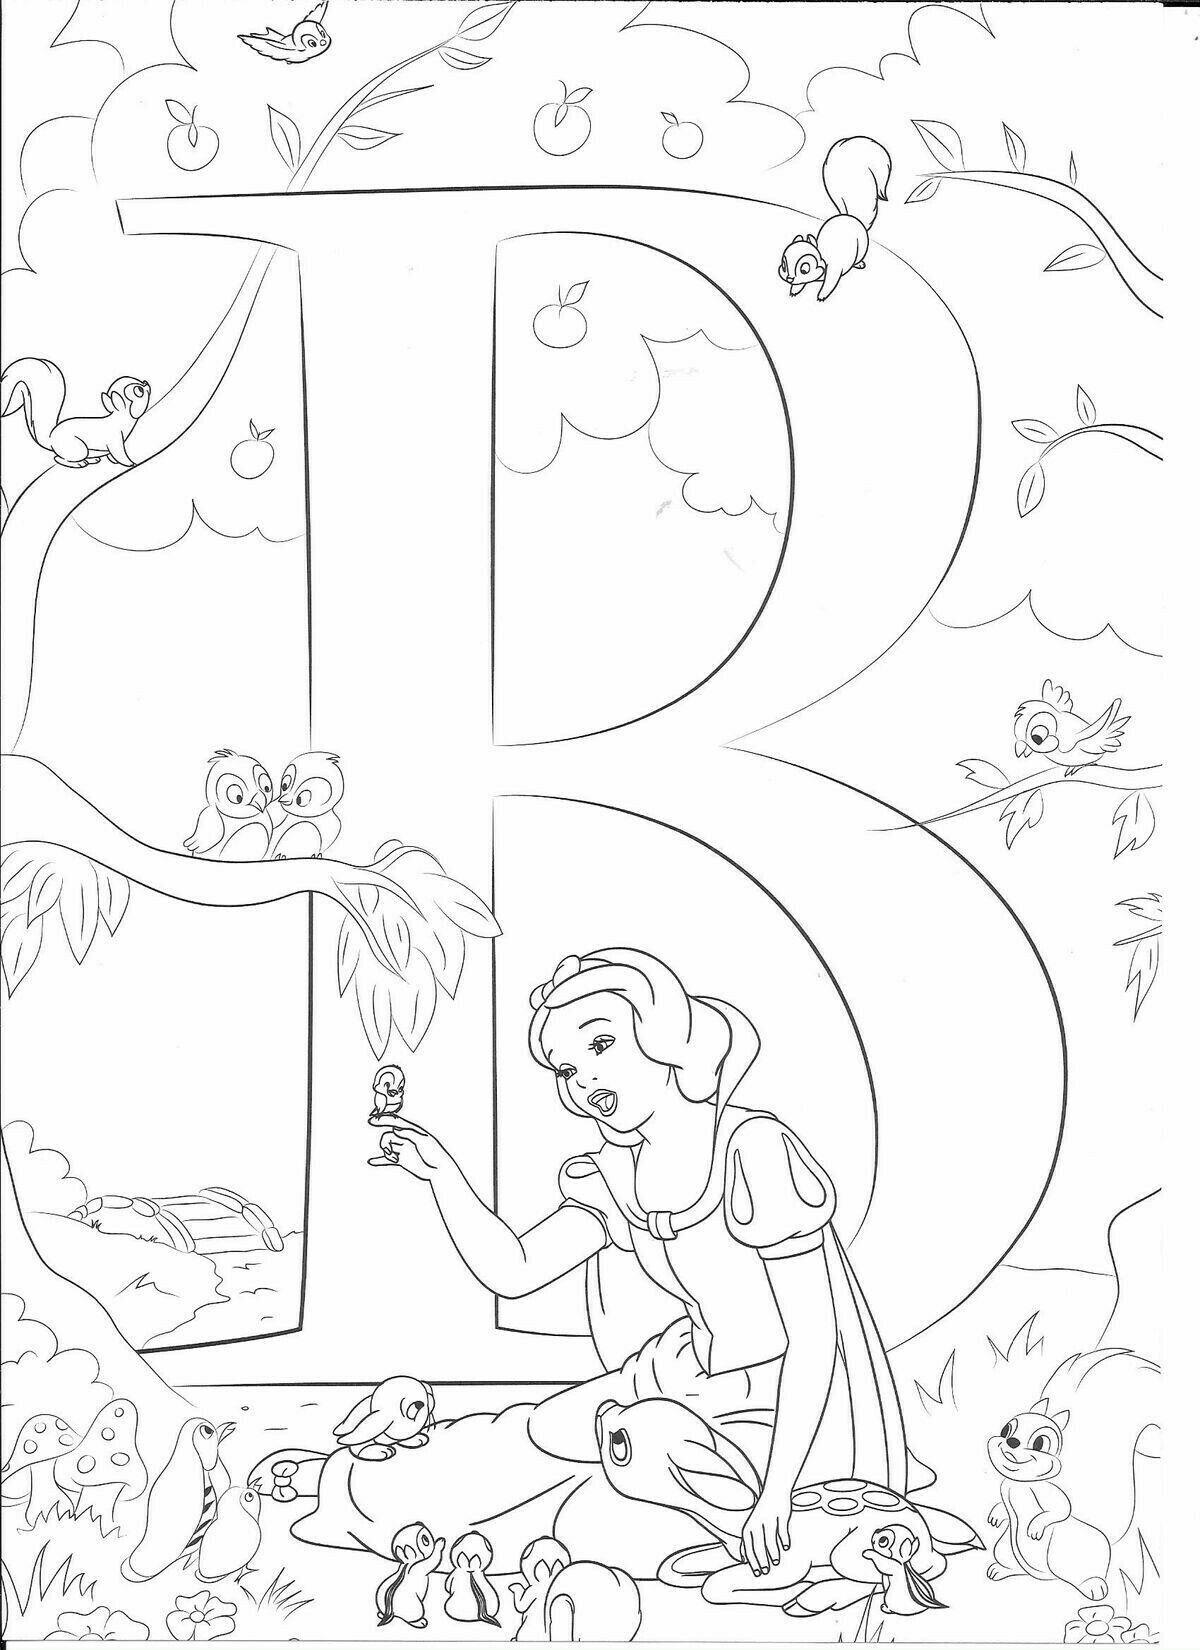 Pin By Yasmine Ortiz On Abc Princess Abc Coloring Pages Disney Coloring Pages Coloring Pages [ 1650 x 1200 Pixel ]